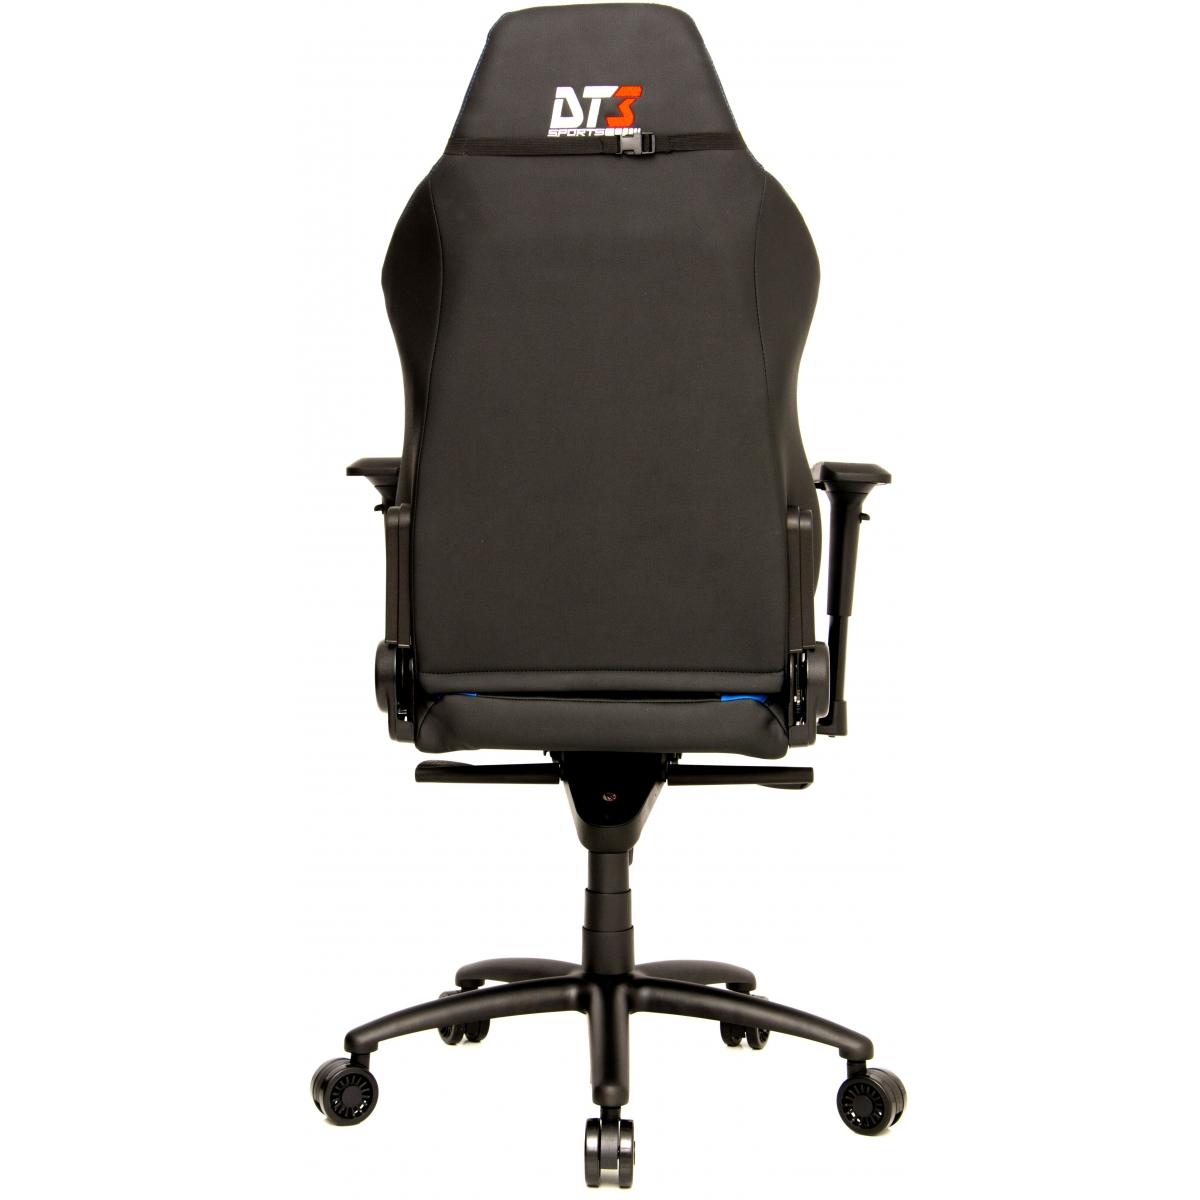 Cadeira Gamer DT3Sports Elite Orion, Blue